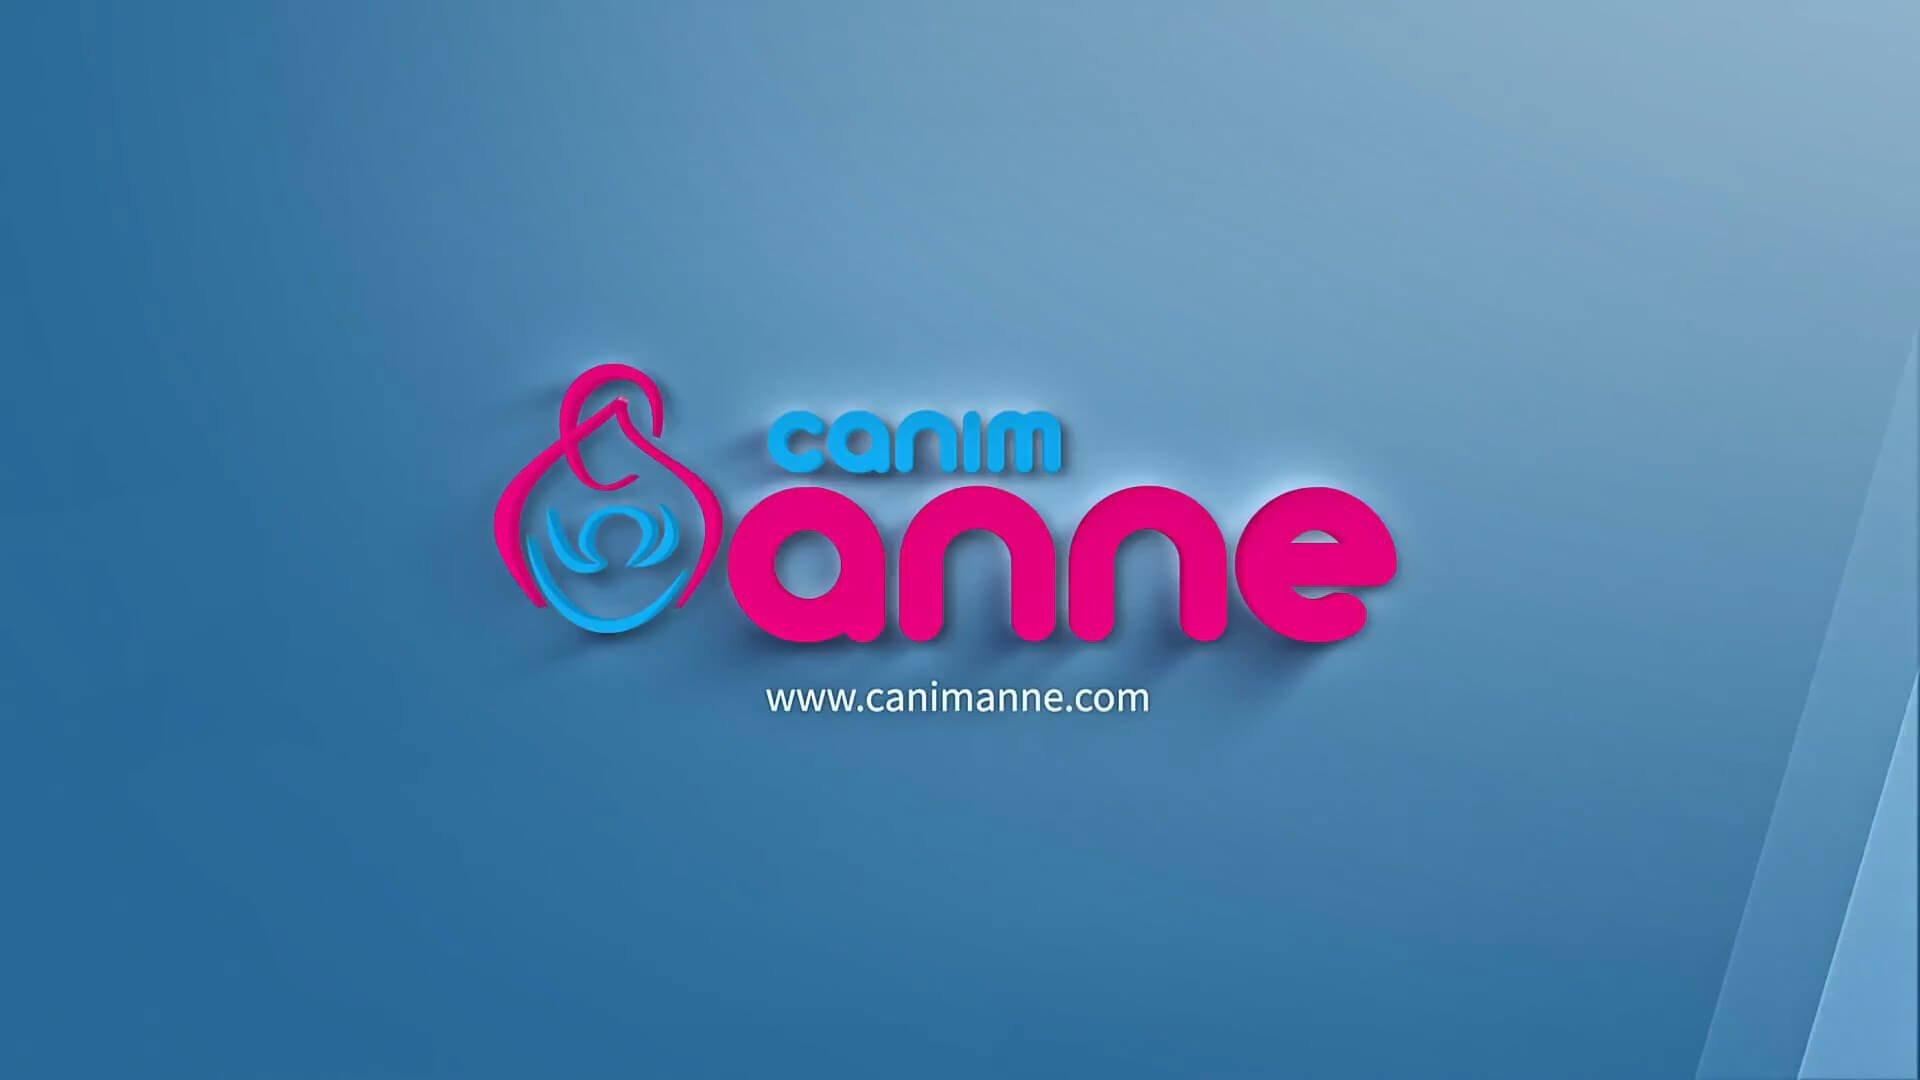 Canımanne7 1920x1080 - Canimanne.com Animasyon Filmi